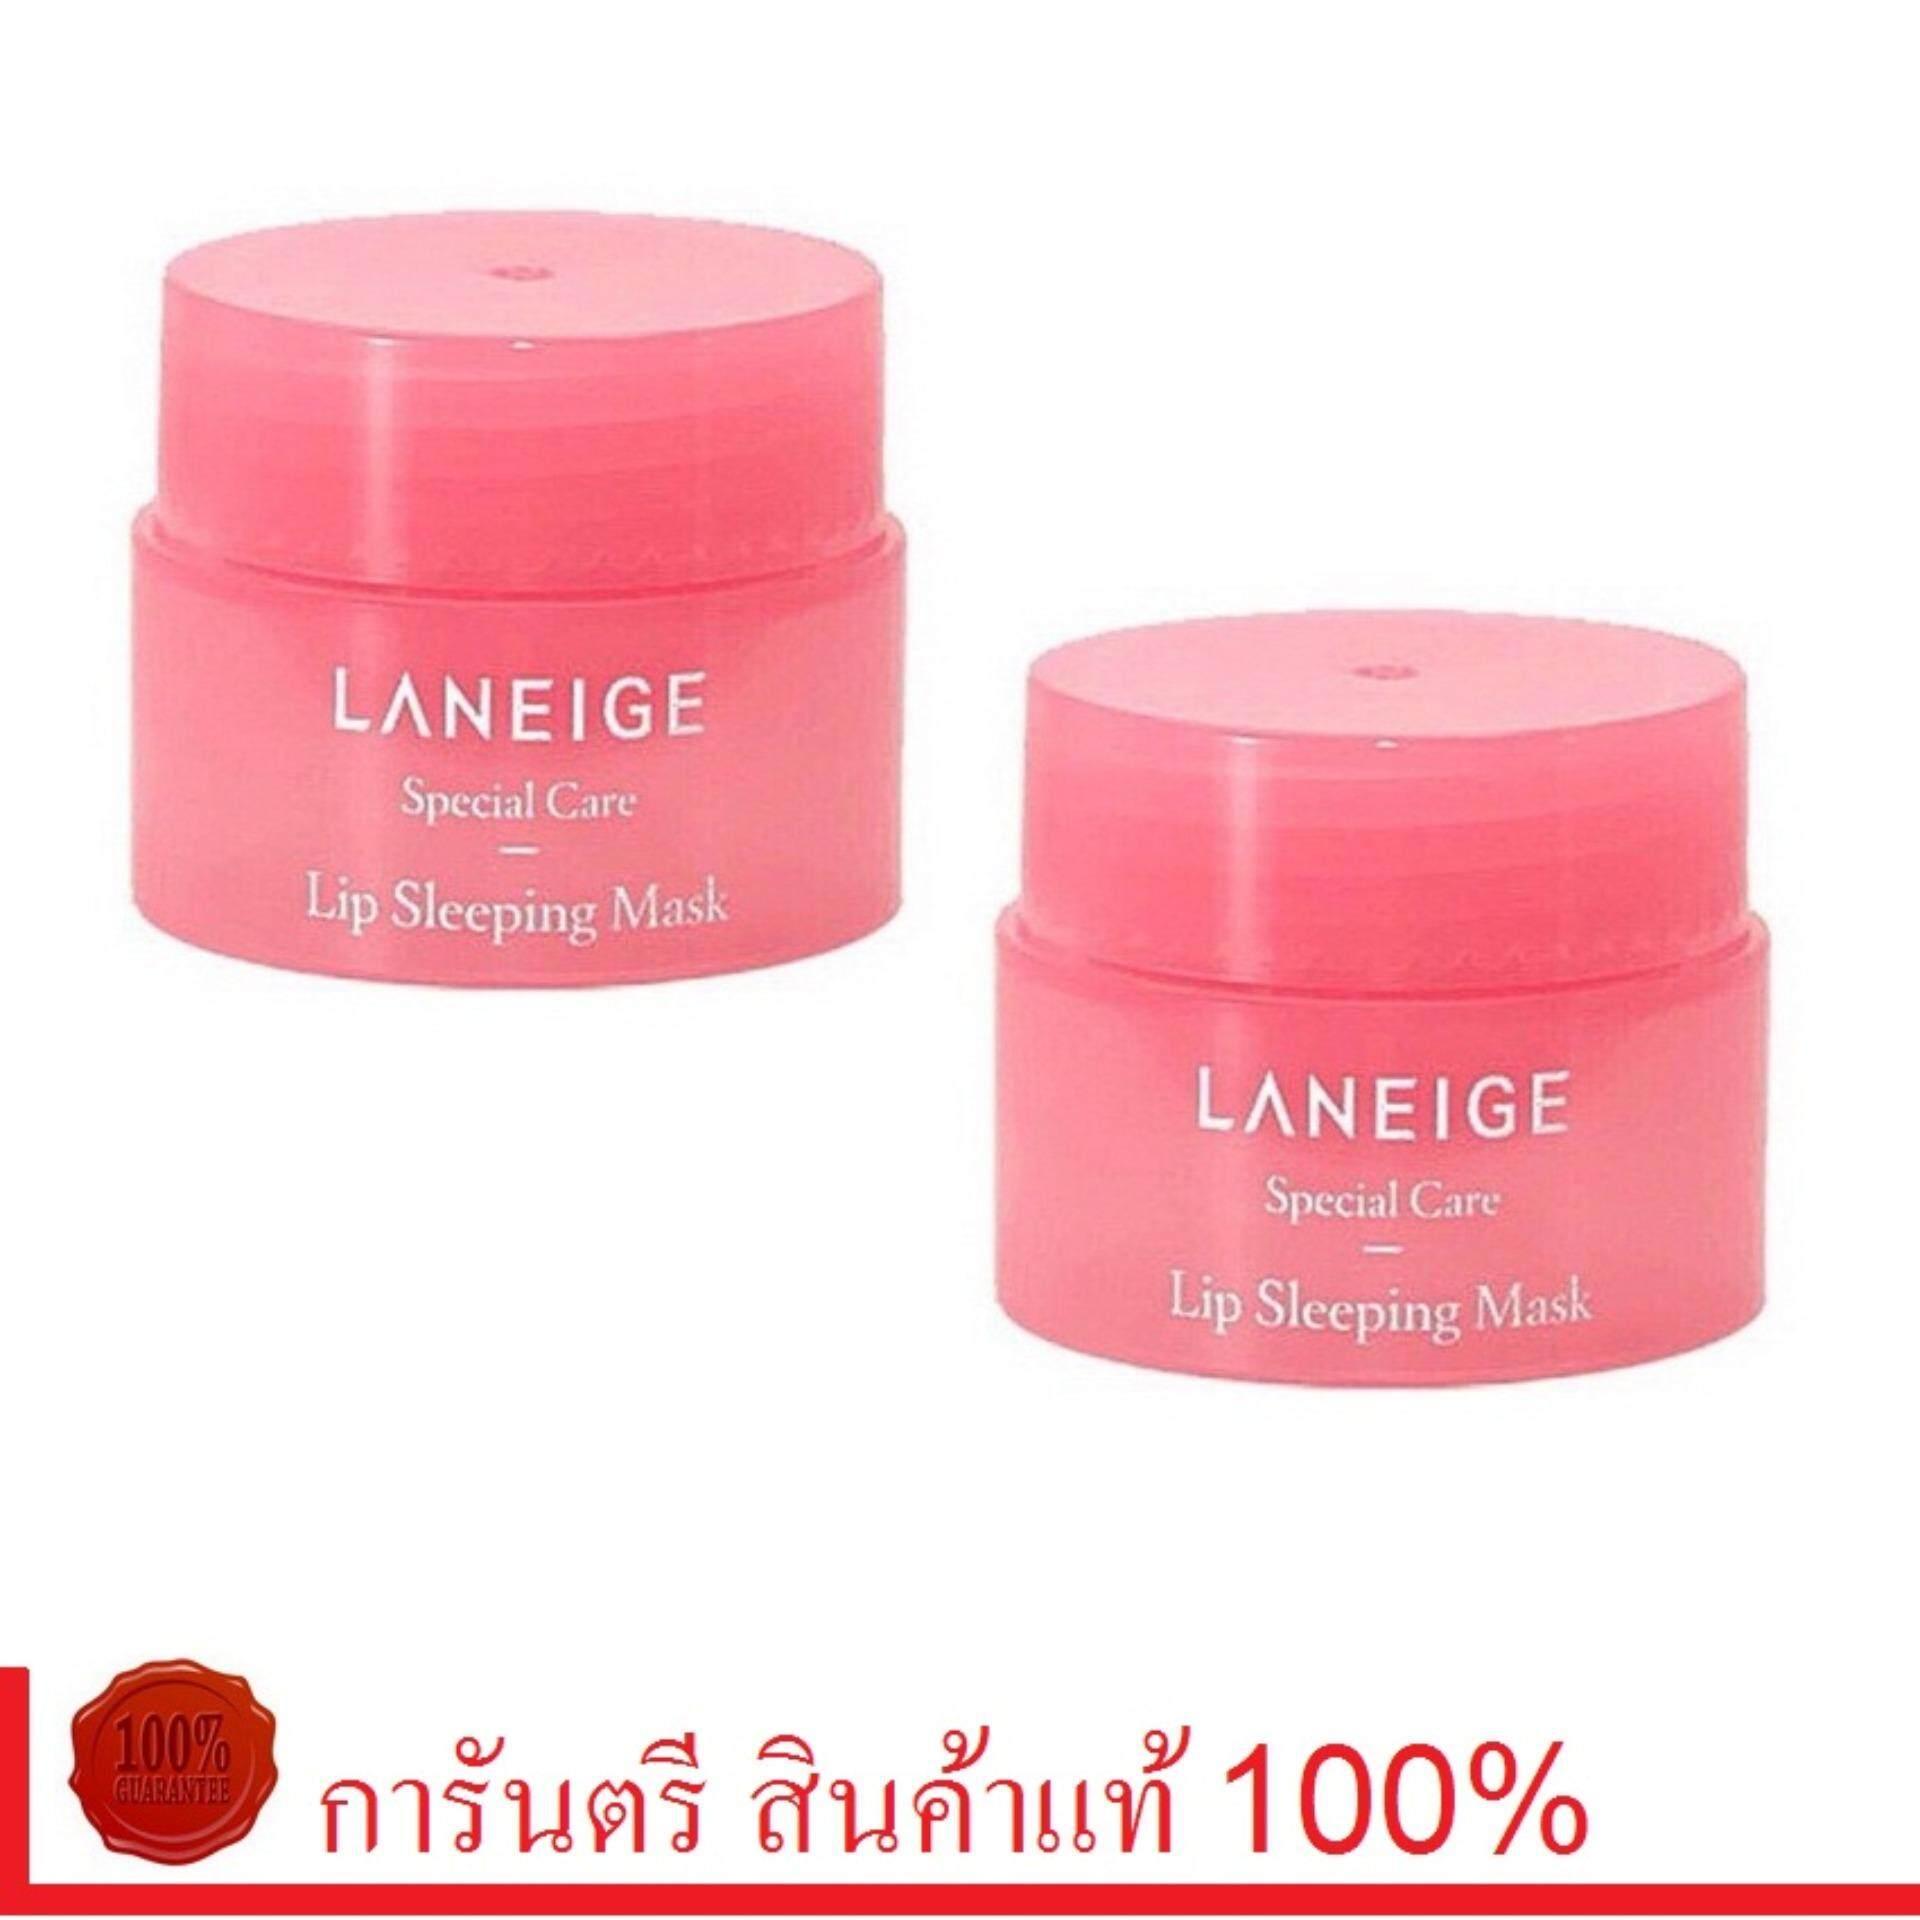 Laneige Special Care Lip Sleeping Mask (3g.x 2 กระปุก) By Luxurymall.